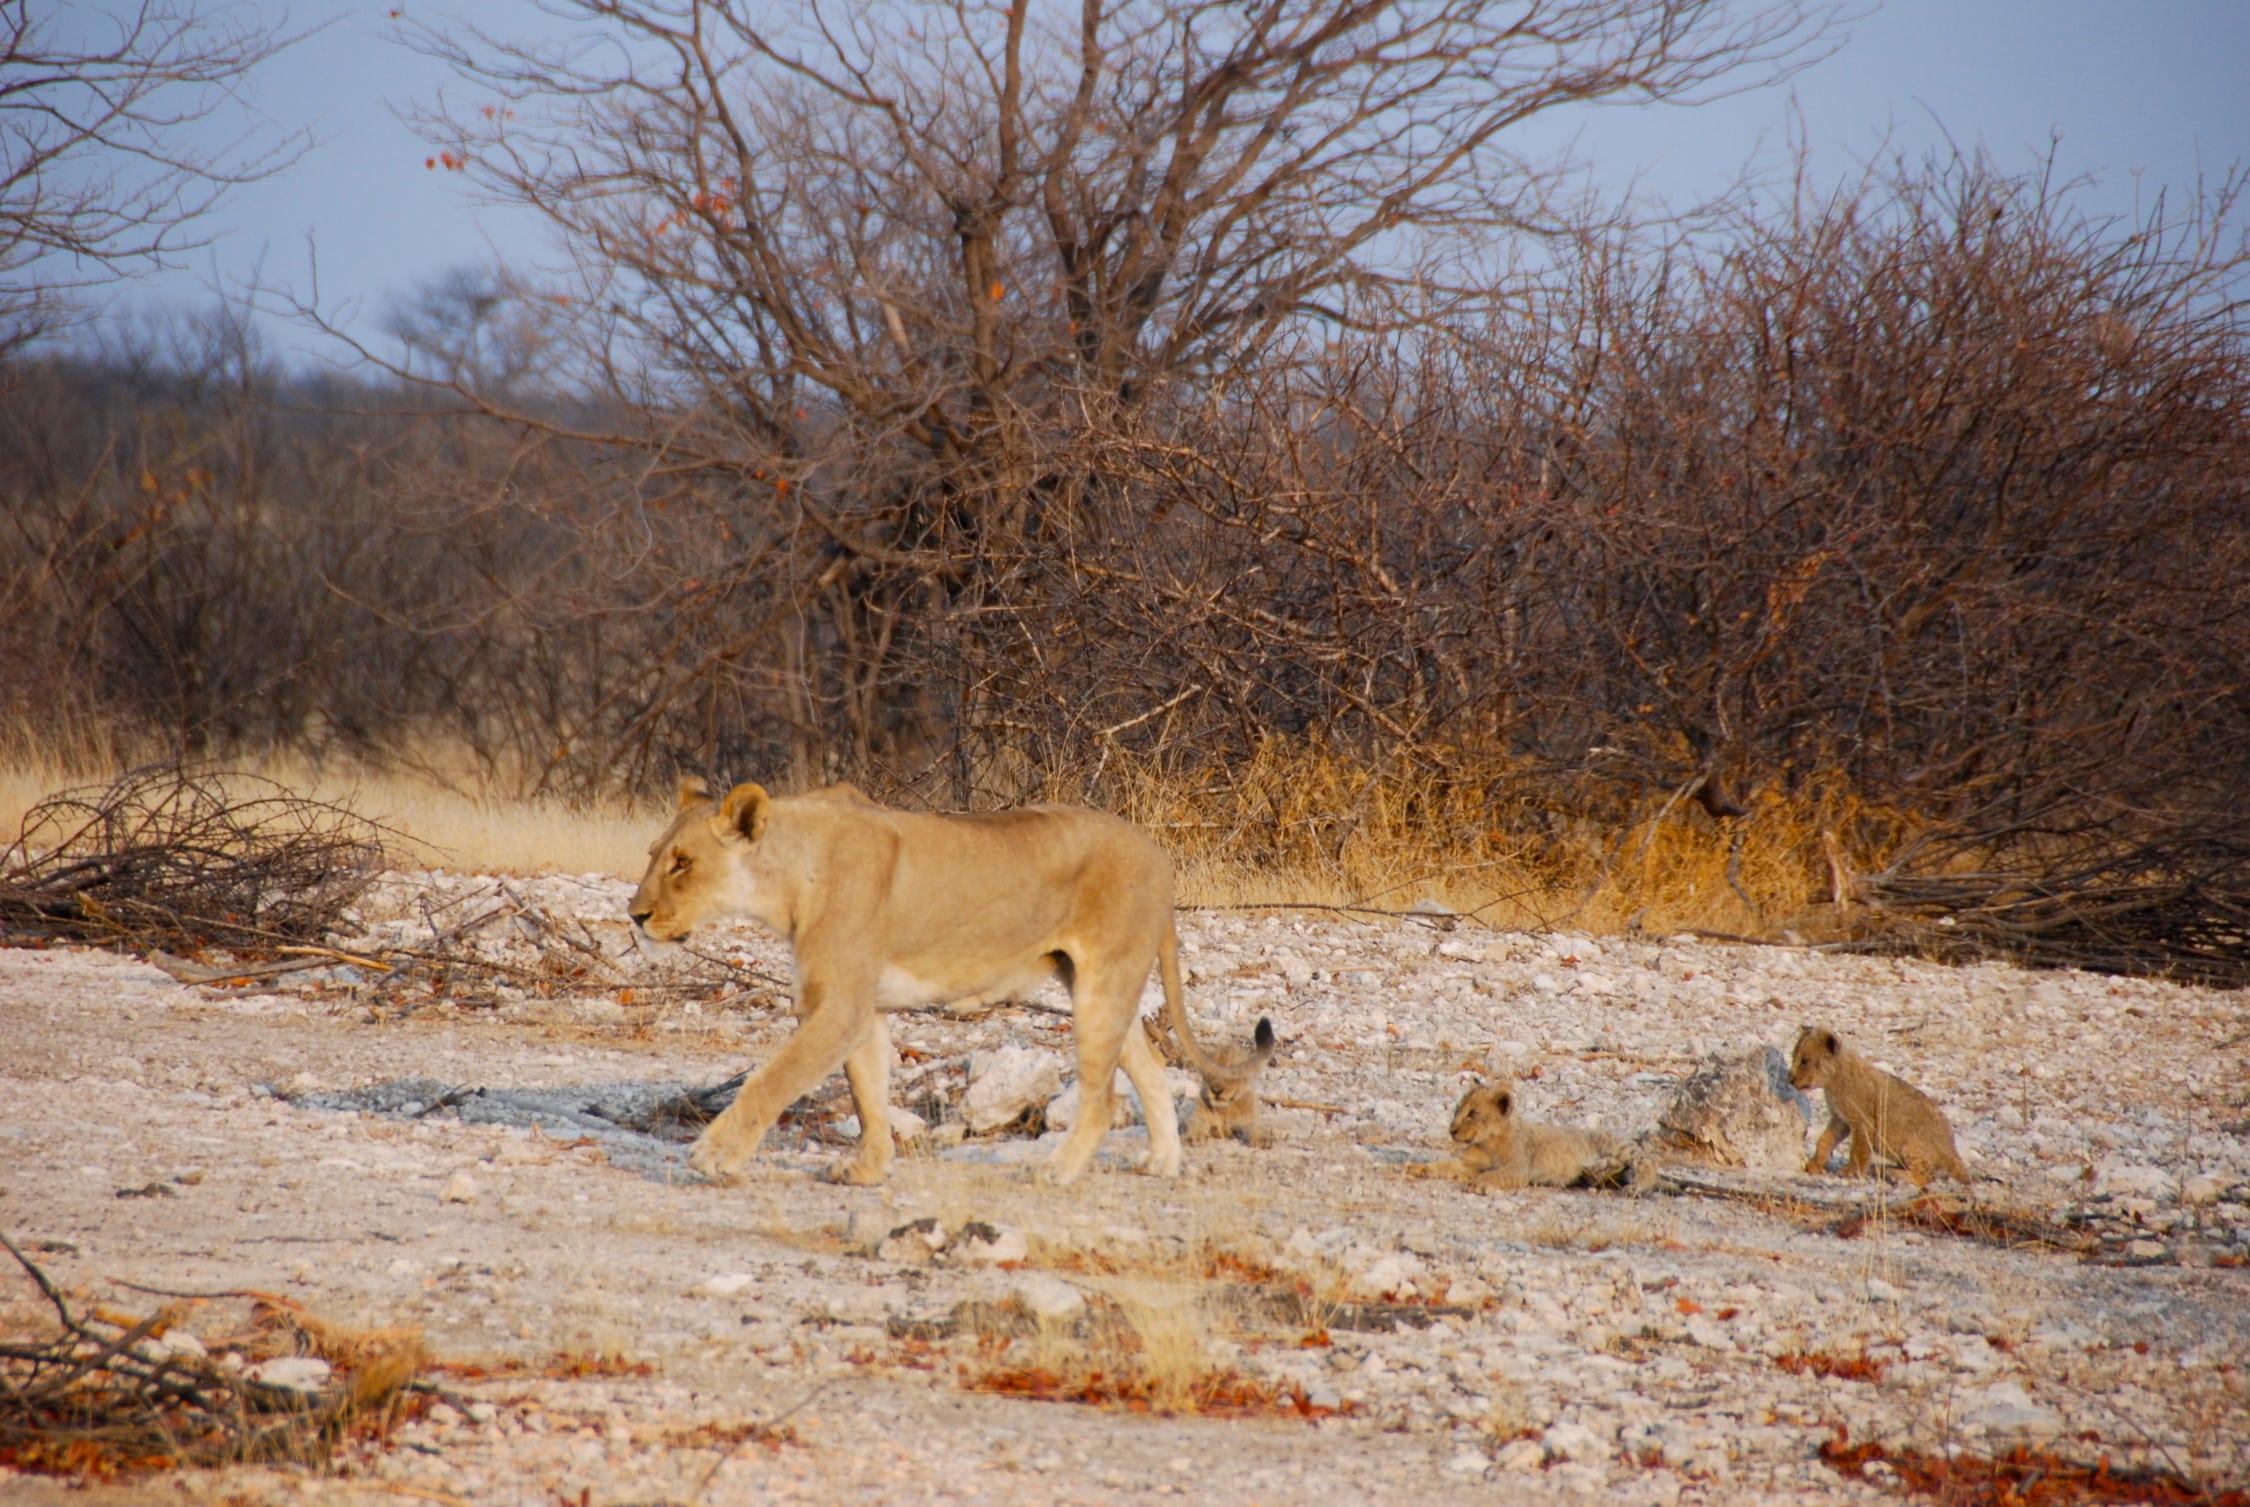 420 kms tarmac. Accommodation near Etosha National Park.